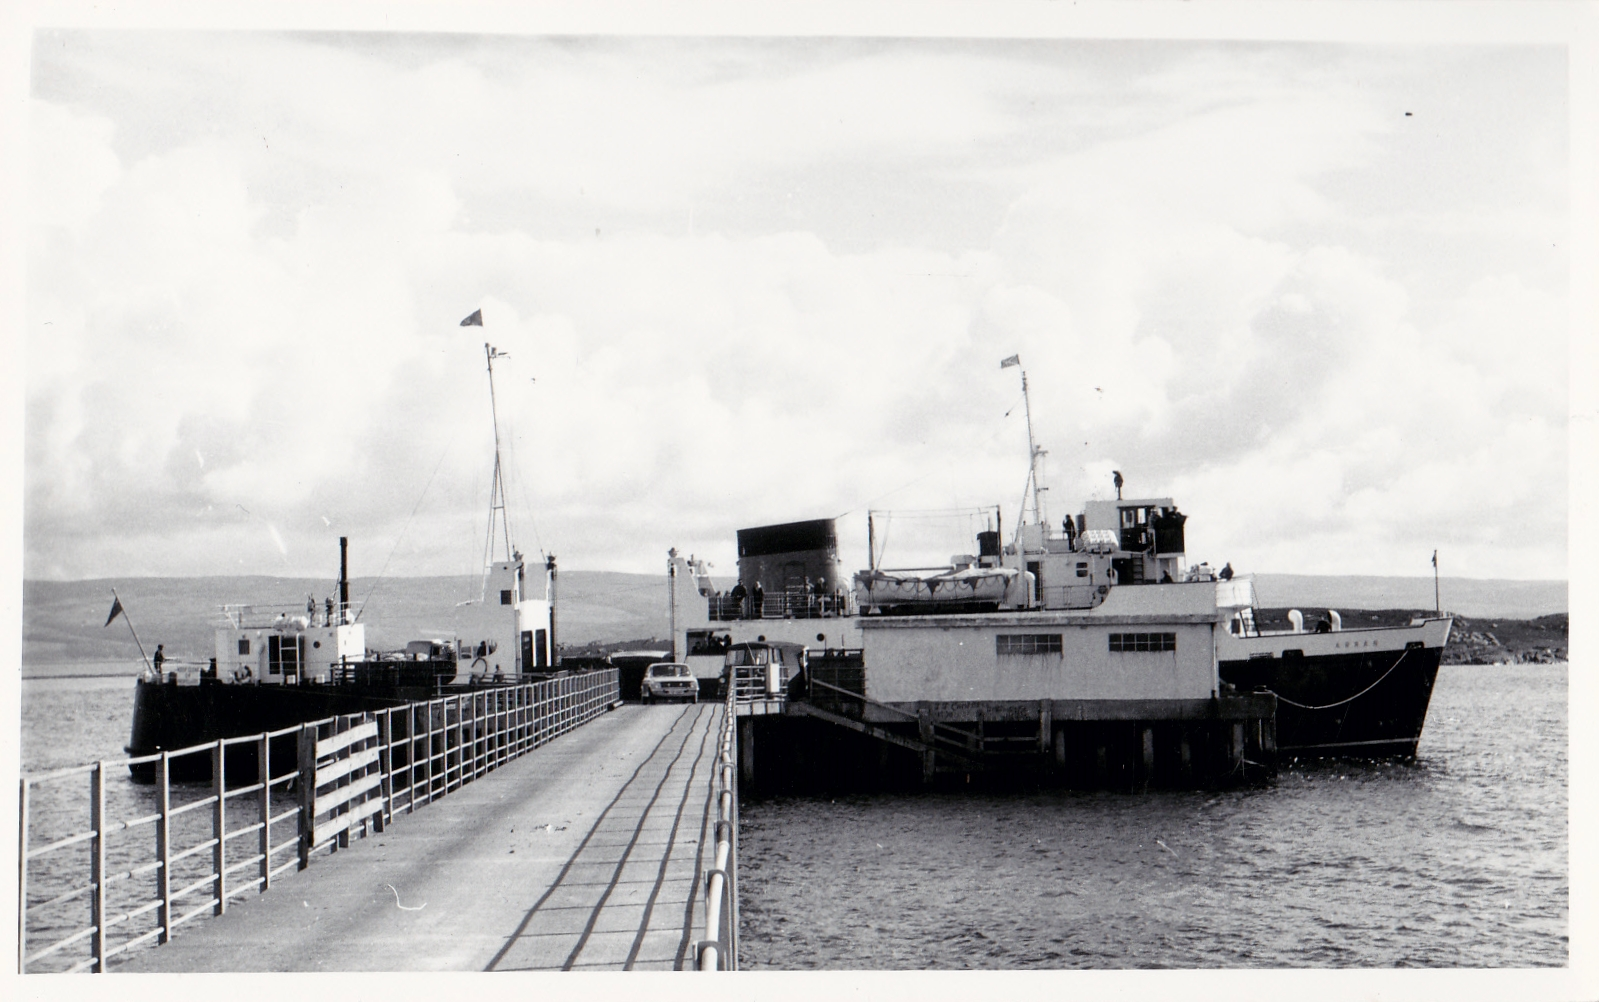 Arran at Gigha pier (Jim Aikman Smith)